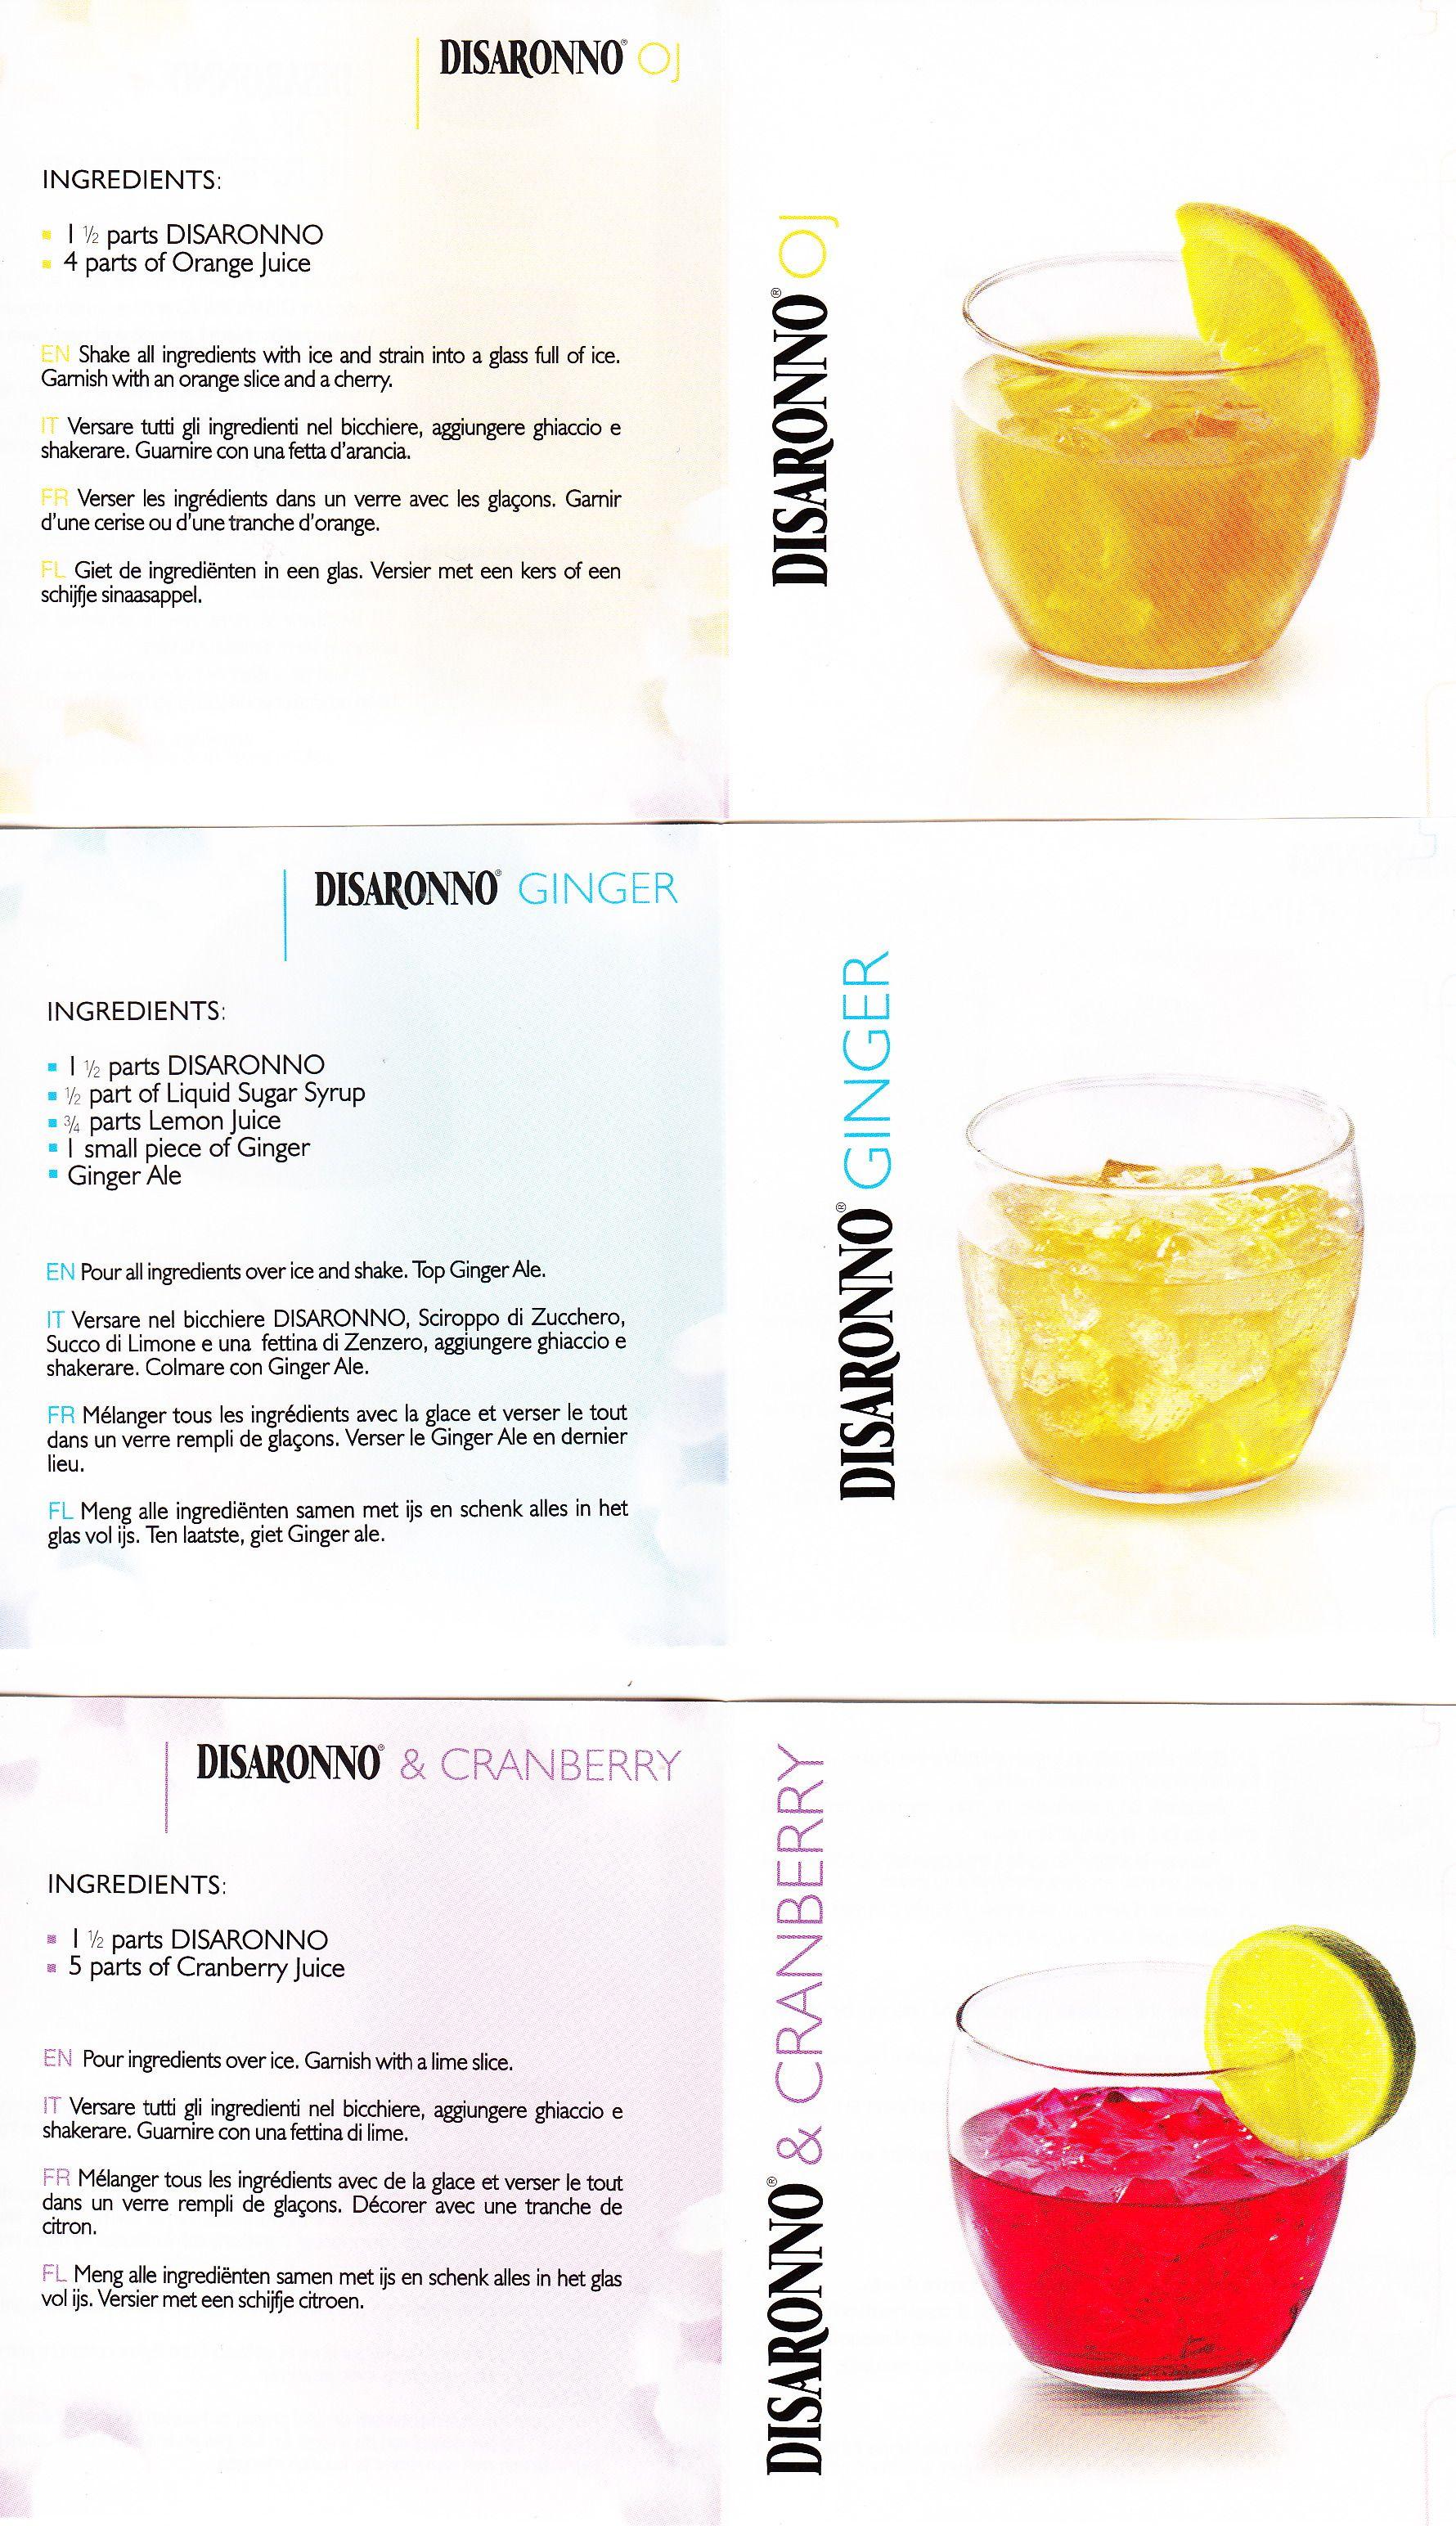 Disaronno Cranberry With Images Disaronno Drinks Disaronno